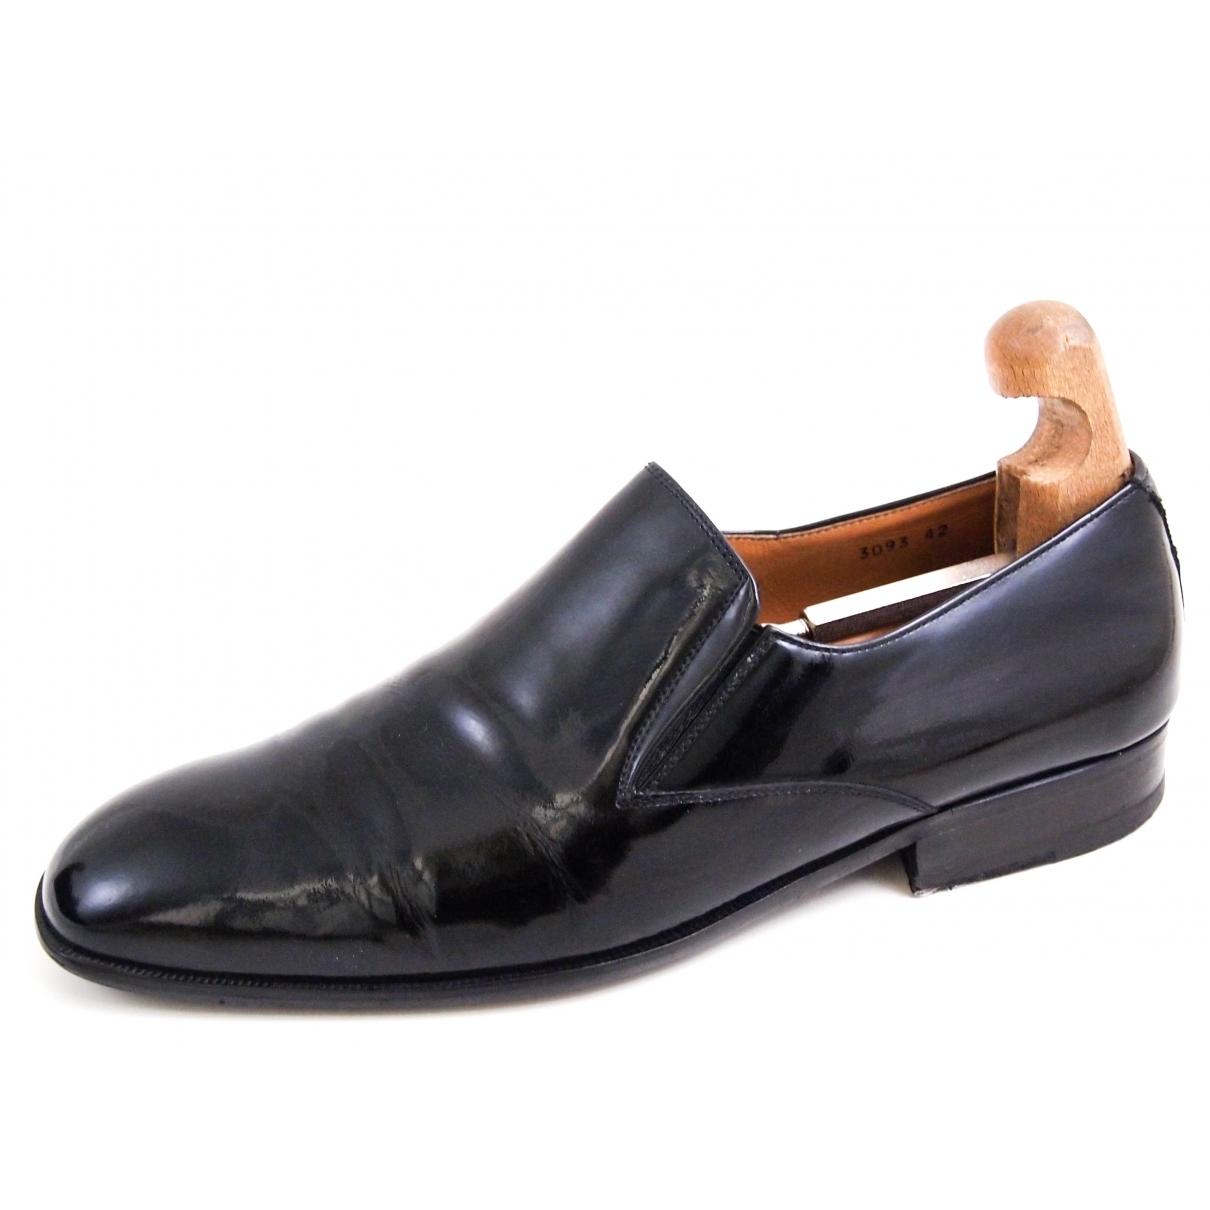 Magnanni \N Black Patent leather Flats for Men 42 EU